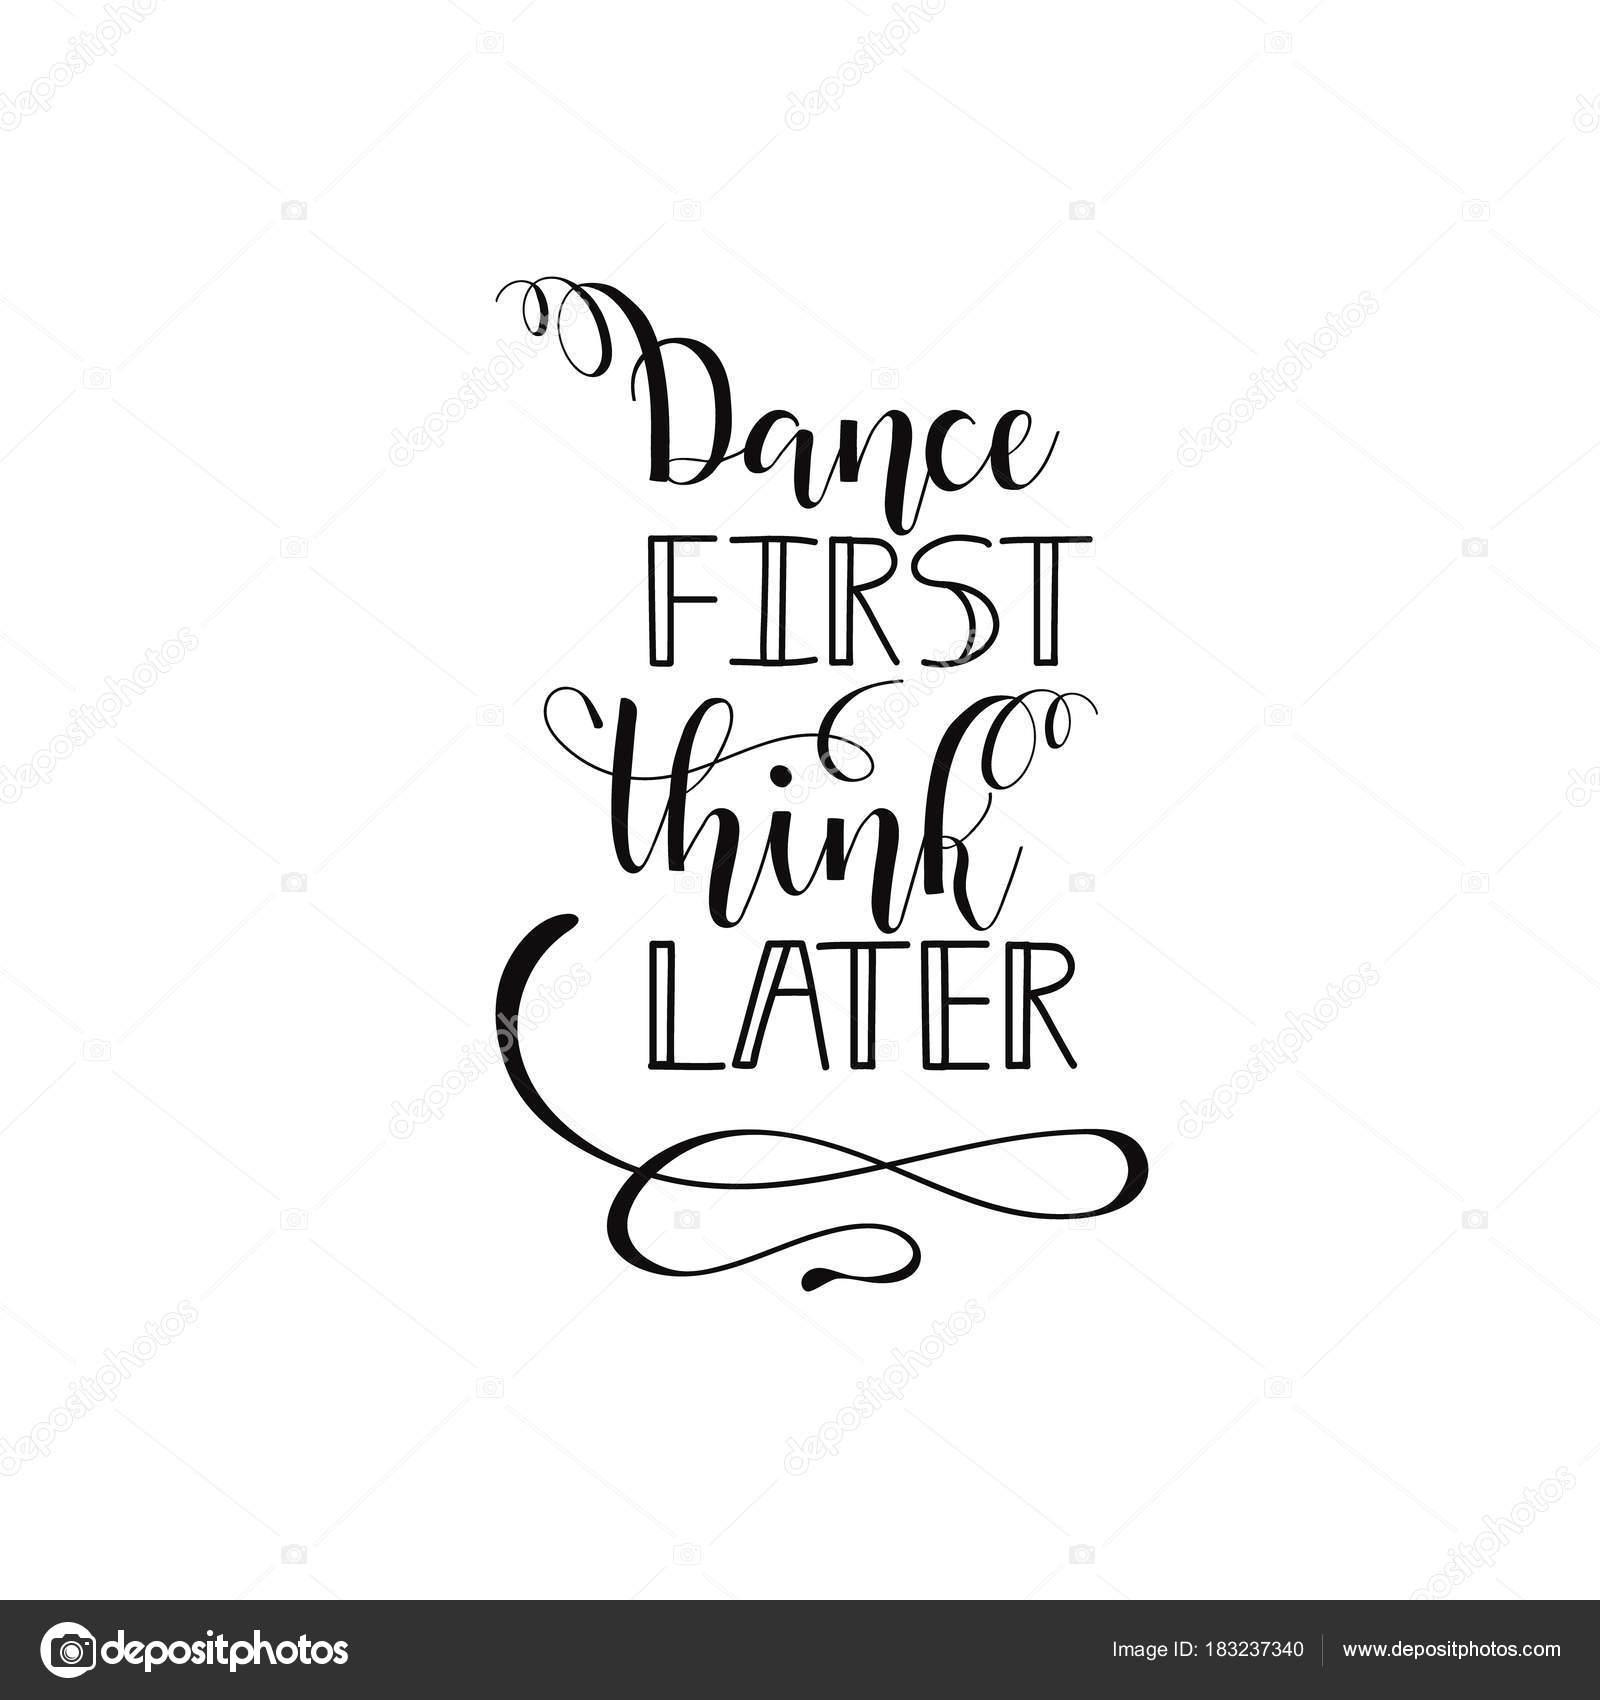 Dance First Think Later Poster Design With Hand Lettered Phrase Perfect For Dance Studio Decor Gift Apparel Design For Dancers Stock Vector C Pidzam4e Ukr Net 183237340,Salon Interior Design Ideas